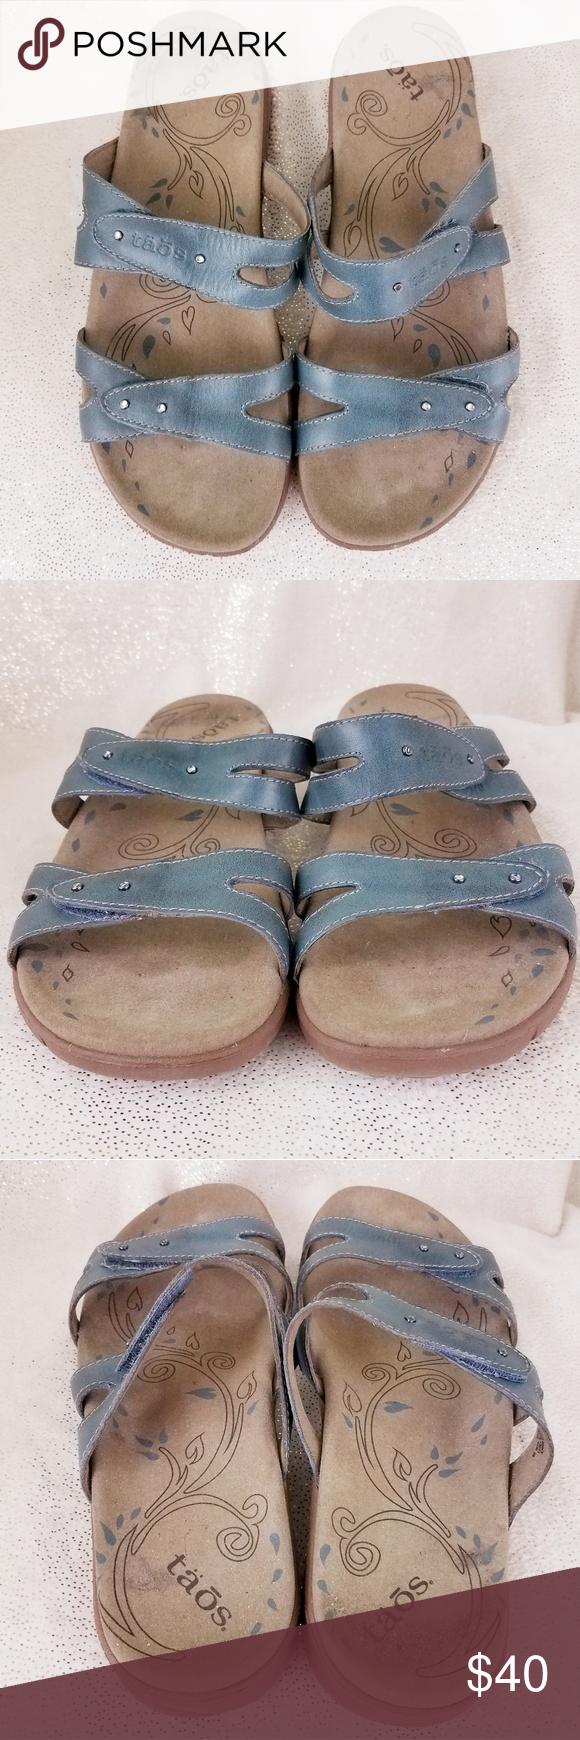 Taos Journey Sandals